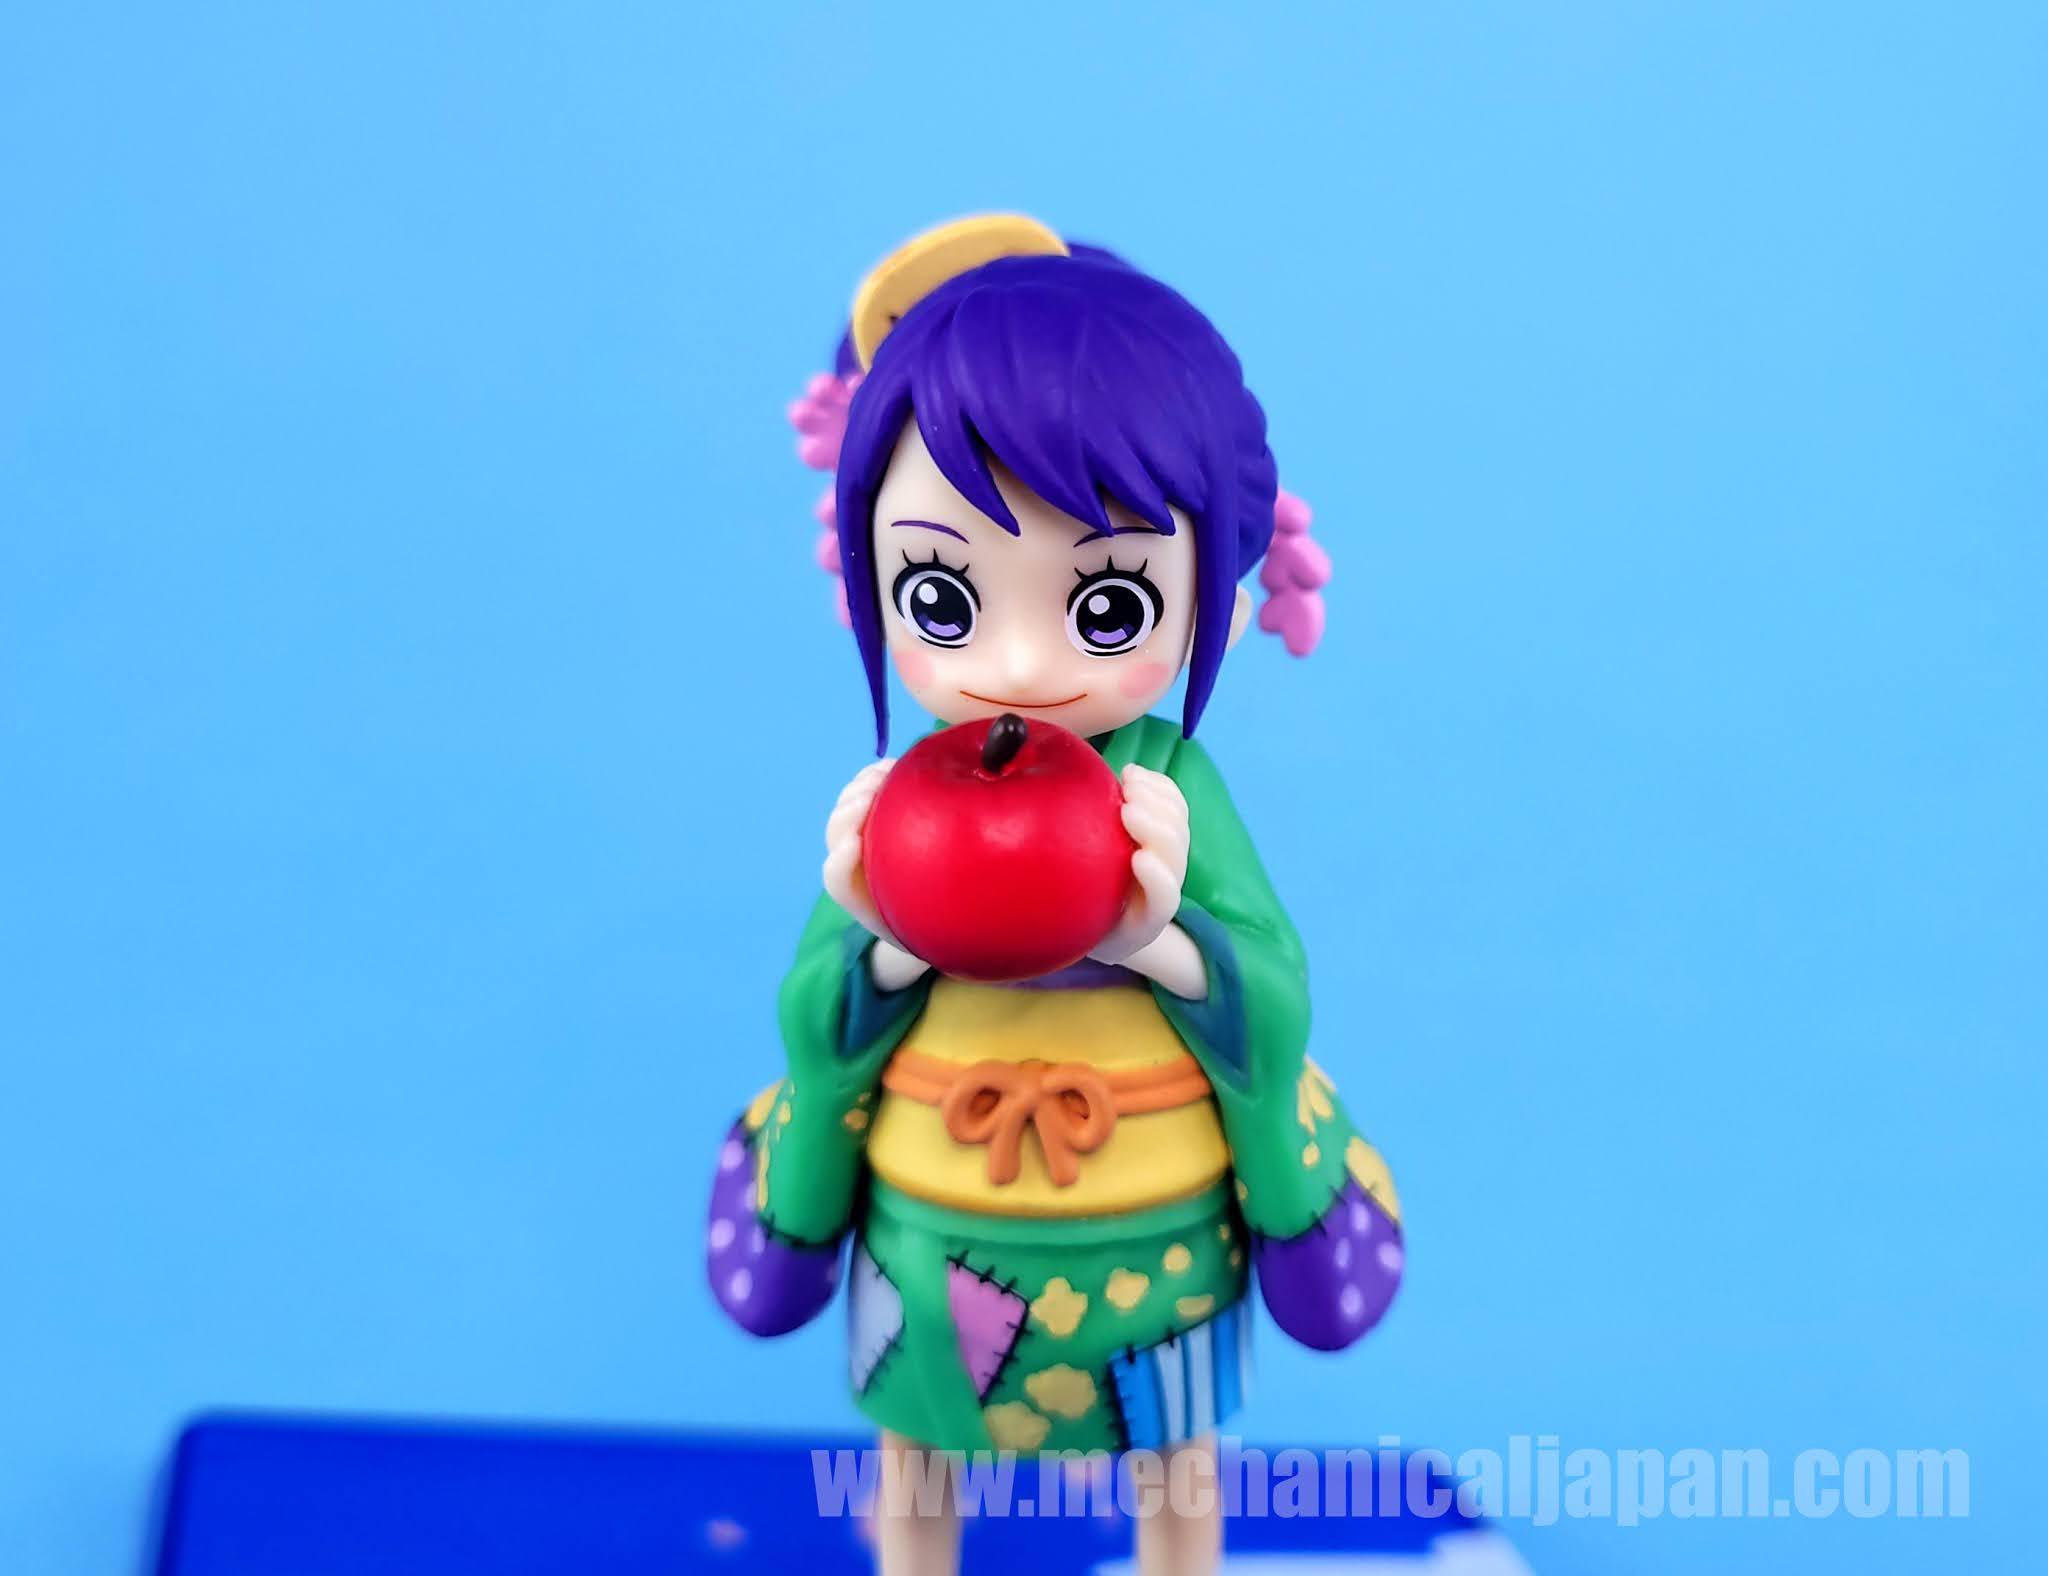 Honekichi